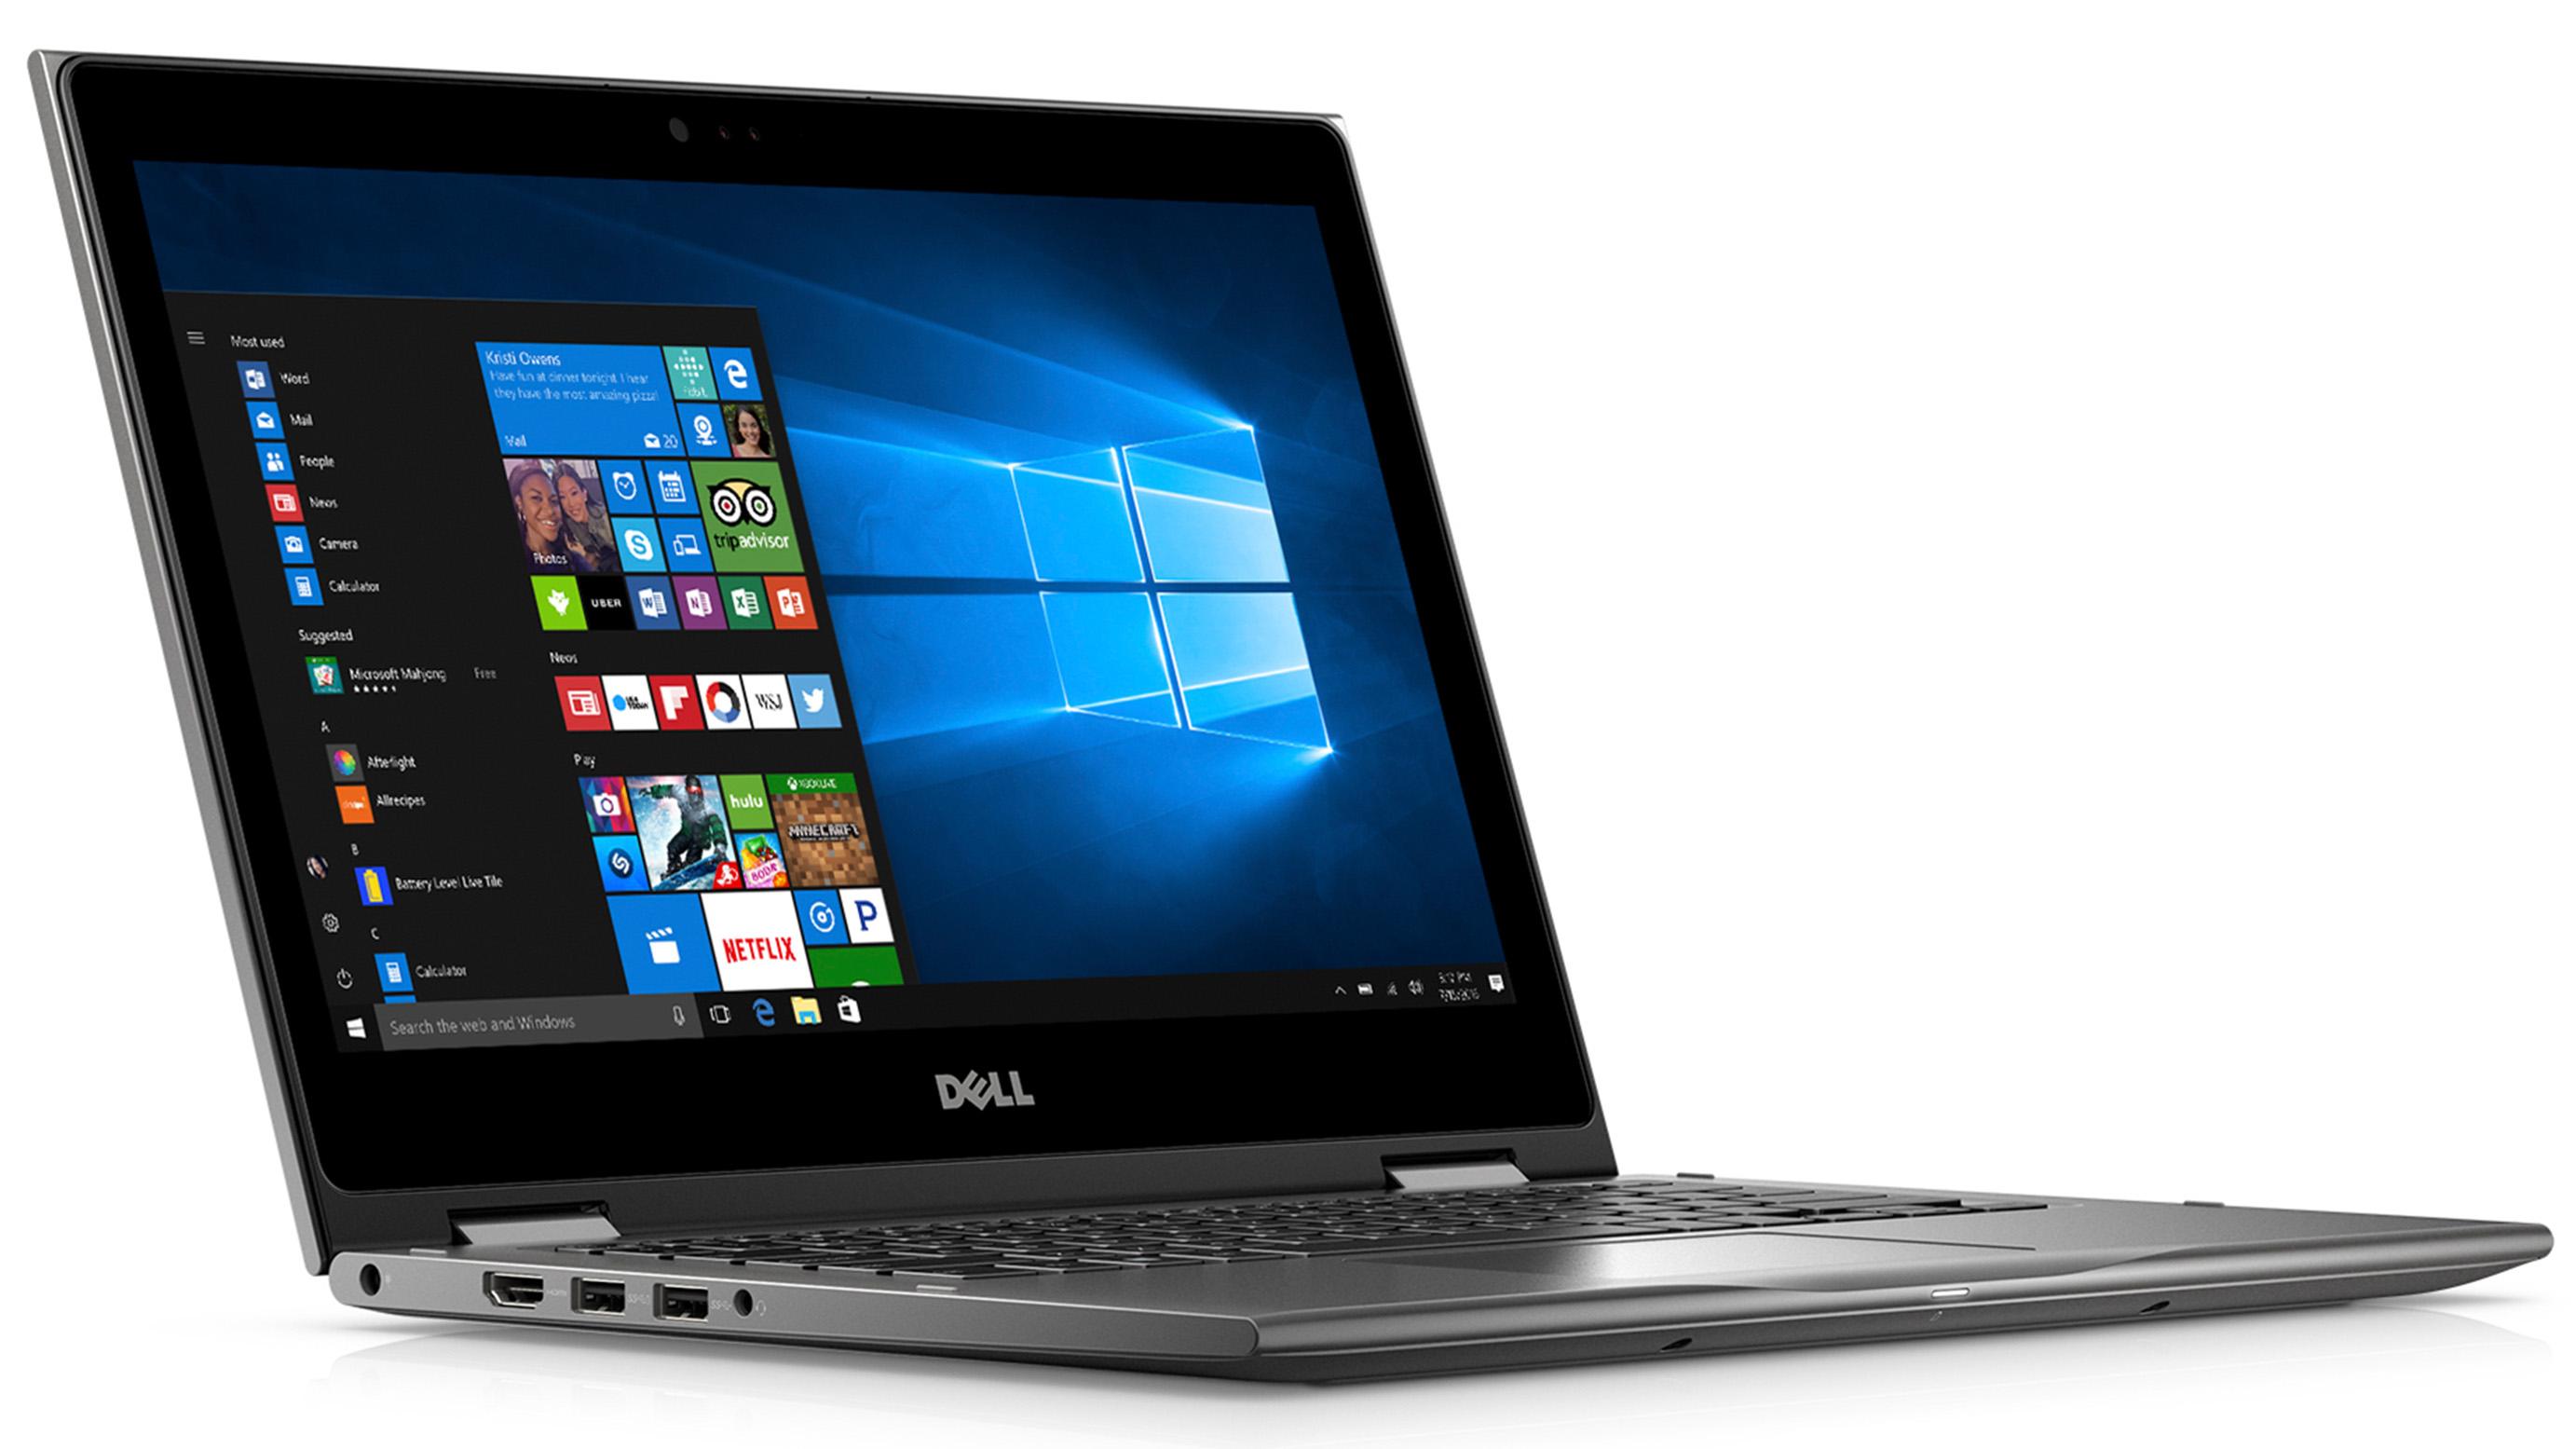 Dell Inspiron 13 i5368-10024GRY Signature Edition 2 in 1 PC